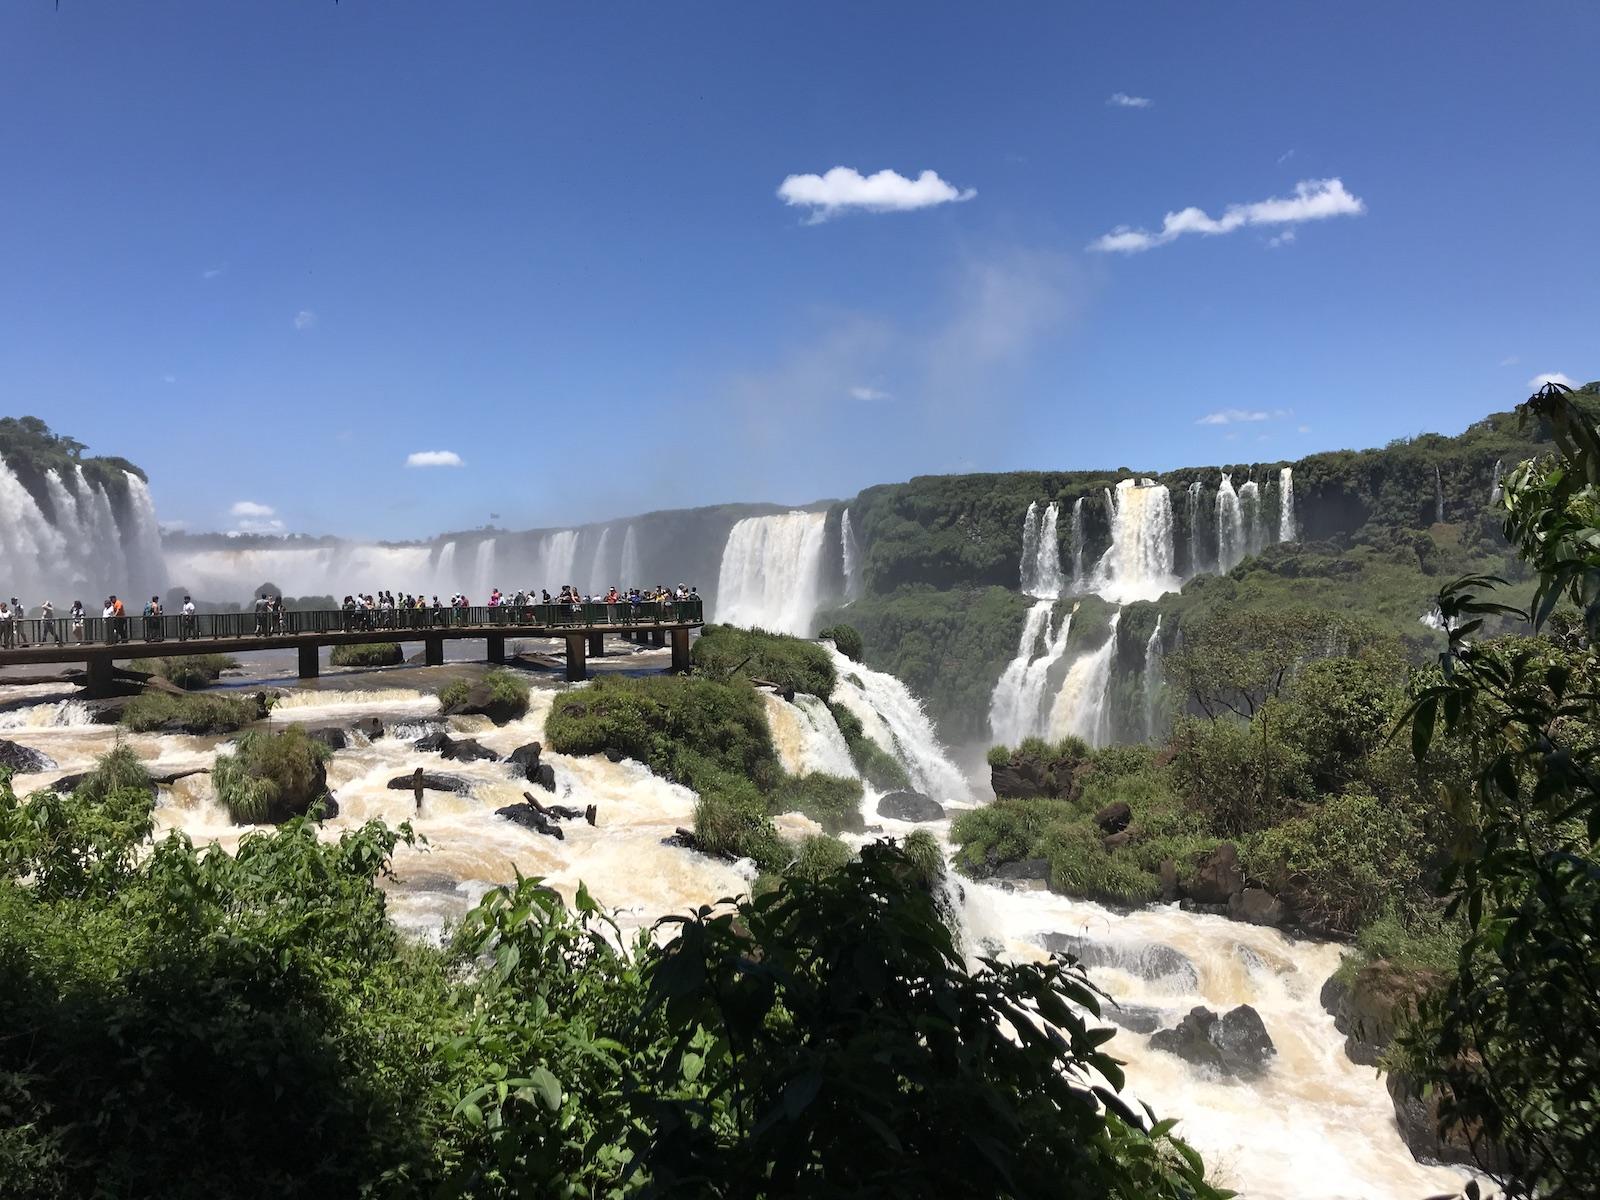 tourameo-reiseplanung-reiseziel-iguacu-faelle-brasilien